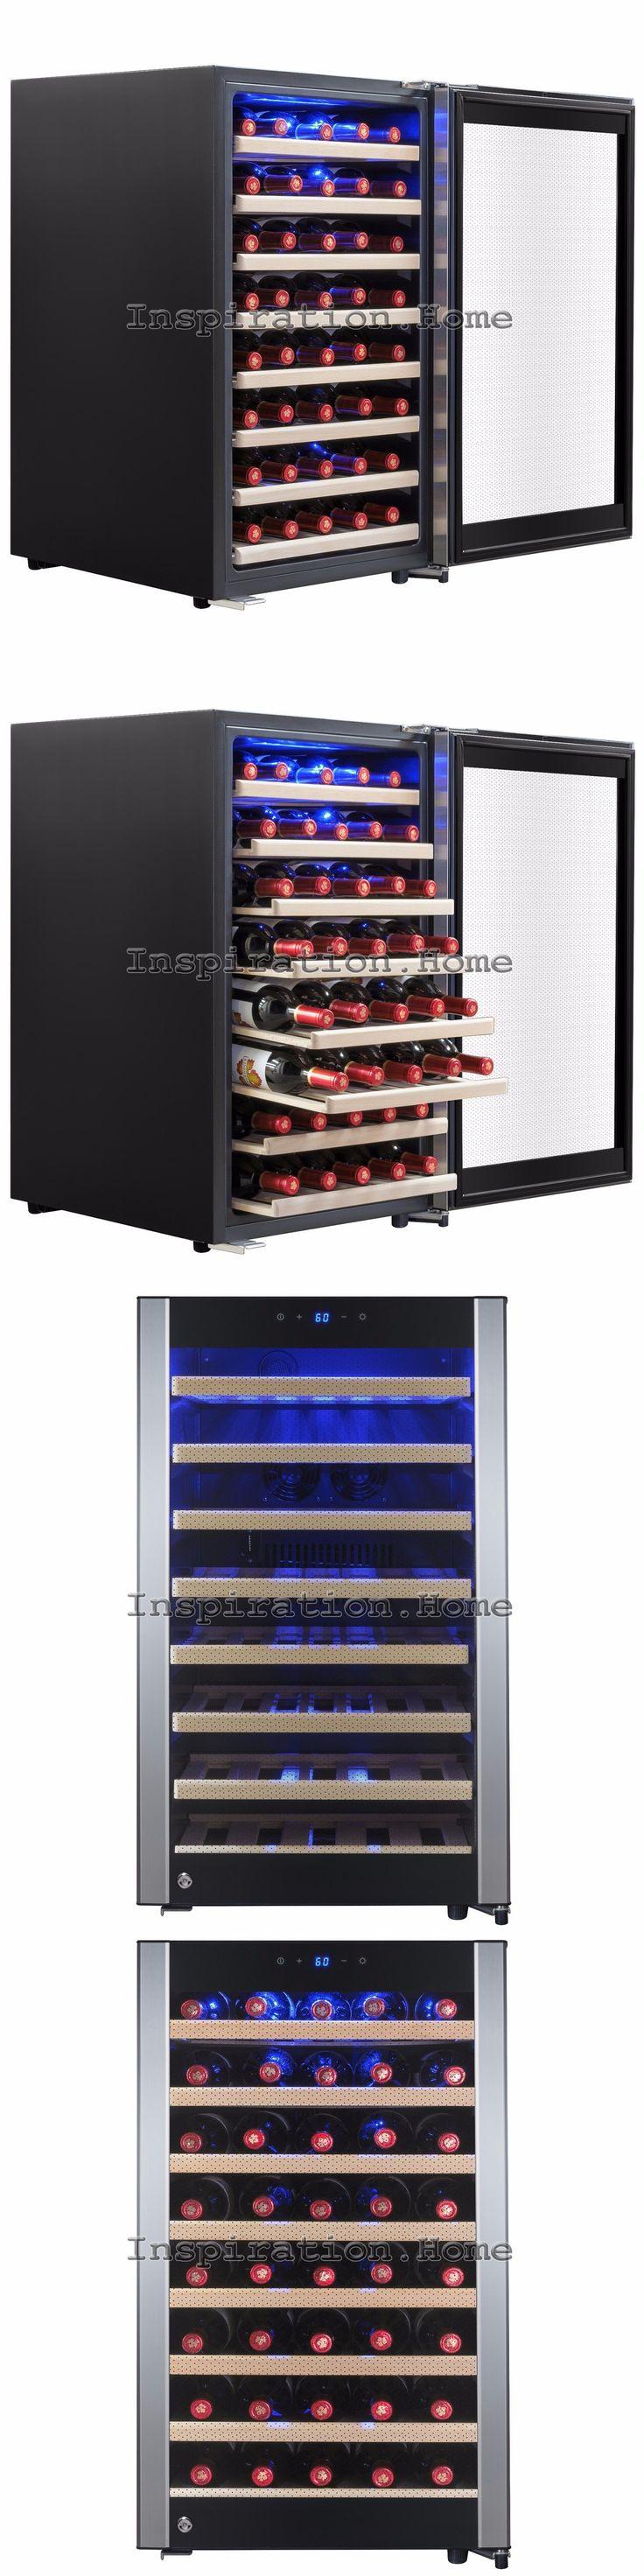 Wine Fridges and Cellars 177750: 52 Bottle Freestanding Single Zone Adjustable Electric Compressor Wine Cooler -> BUY IT NOW ONLY: $519.99 on eBay!